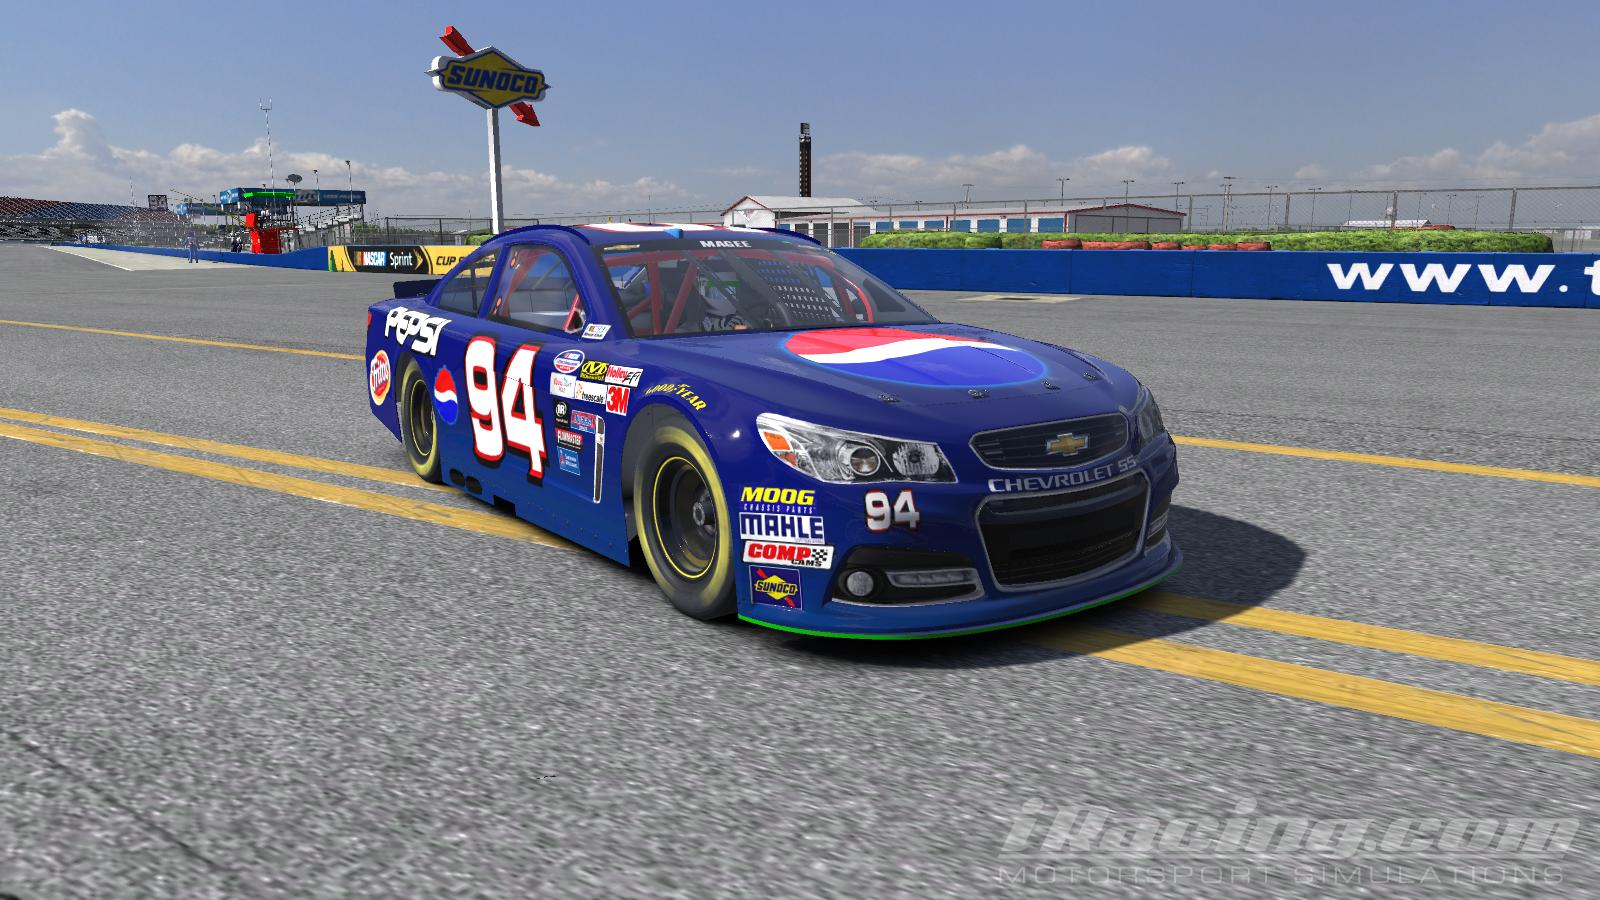 1999 Jeff Gordon Pepsi Busch Series NASCAR Monster Energy Cup Chevrolet SS By Brennan MaGee